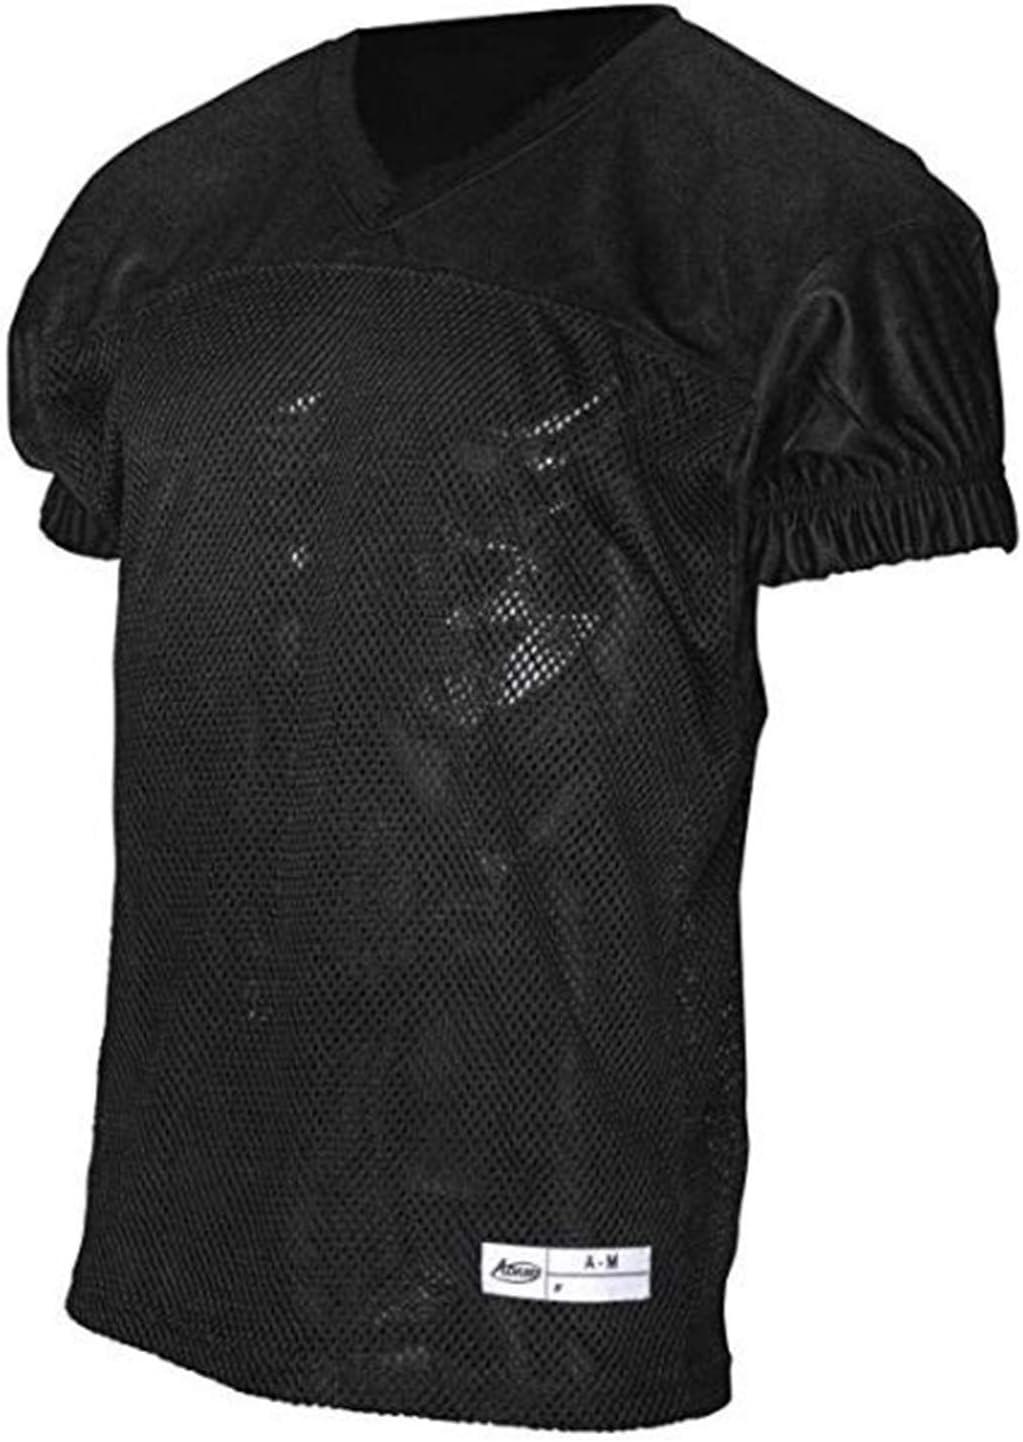 Small Black ADAMS USA Dazzle Varsity Practice Football Jersey